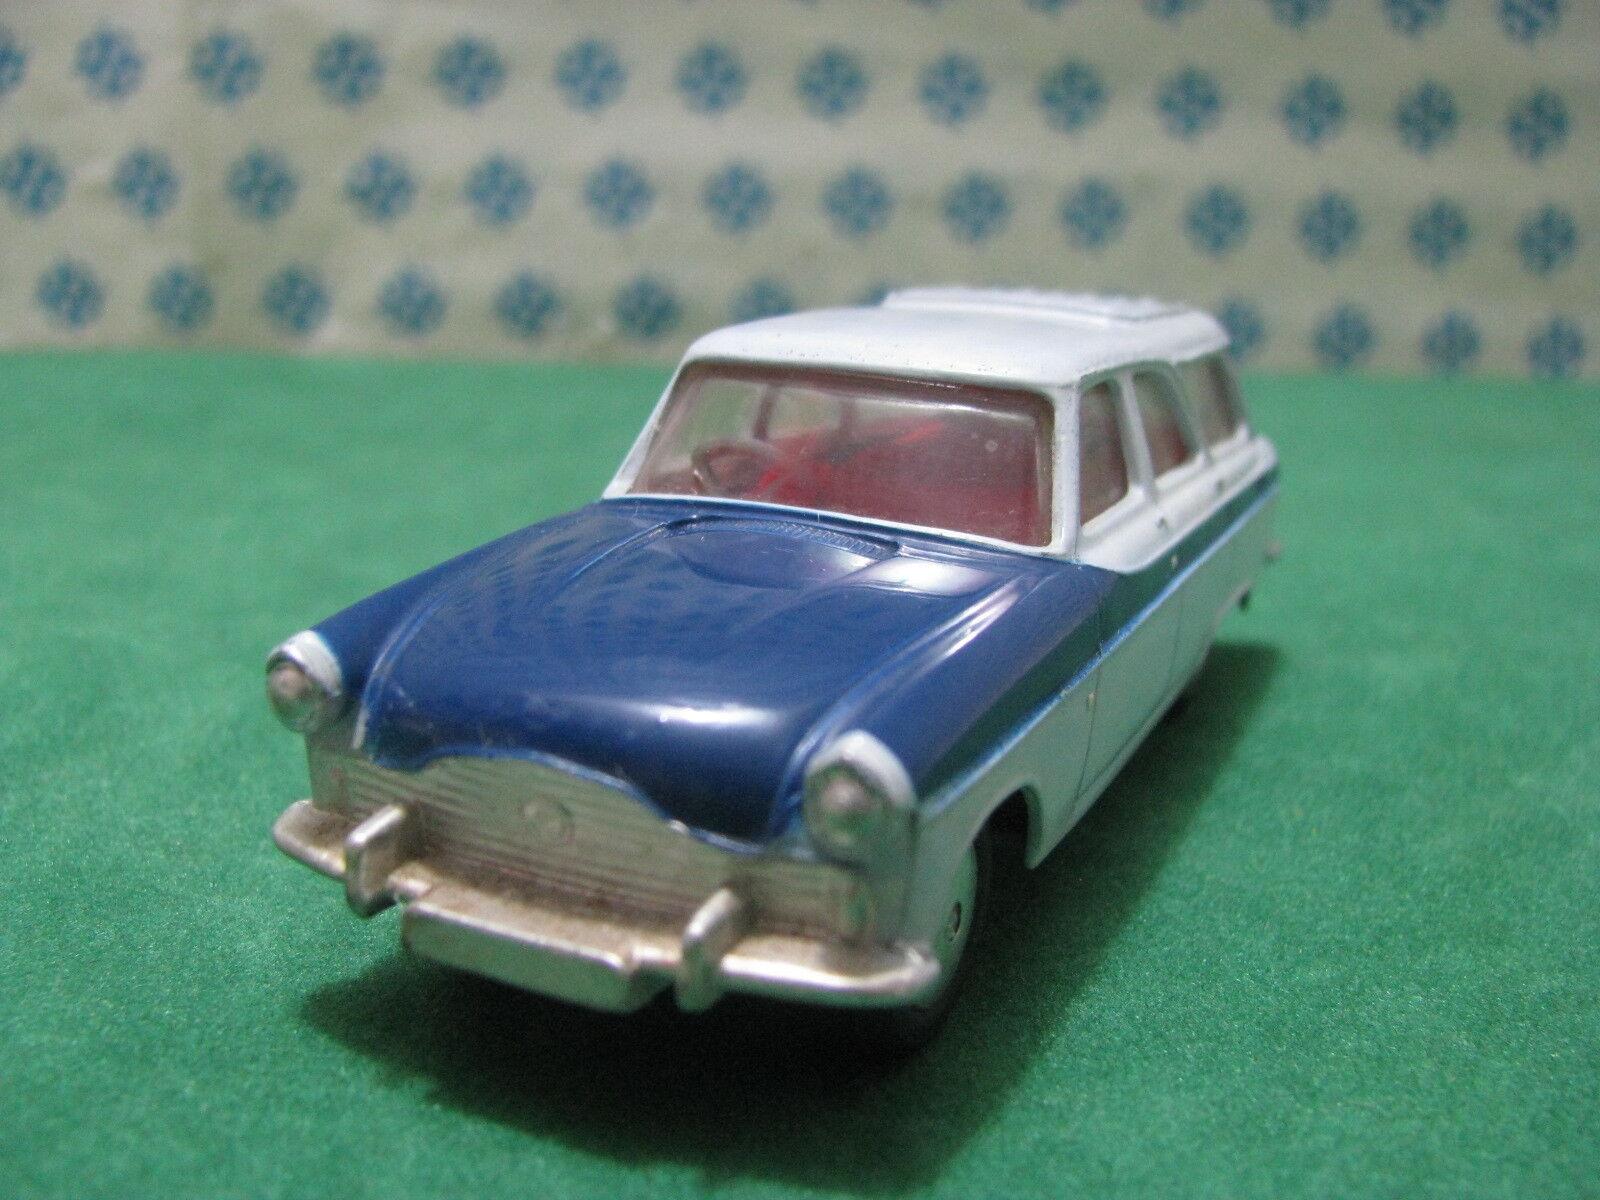 Vintage - Ford Zephyr Inmuebles Coche - 1 43 Corgi Toys 424